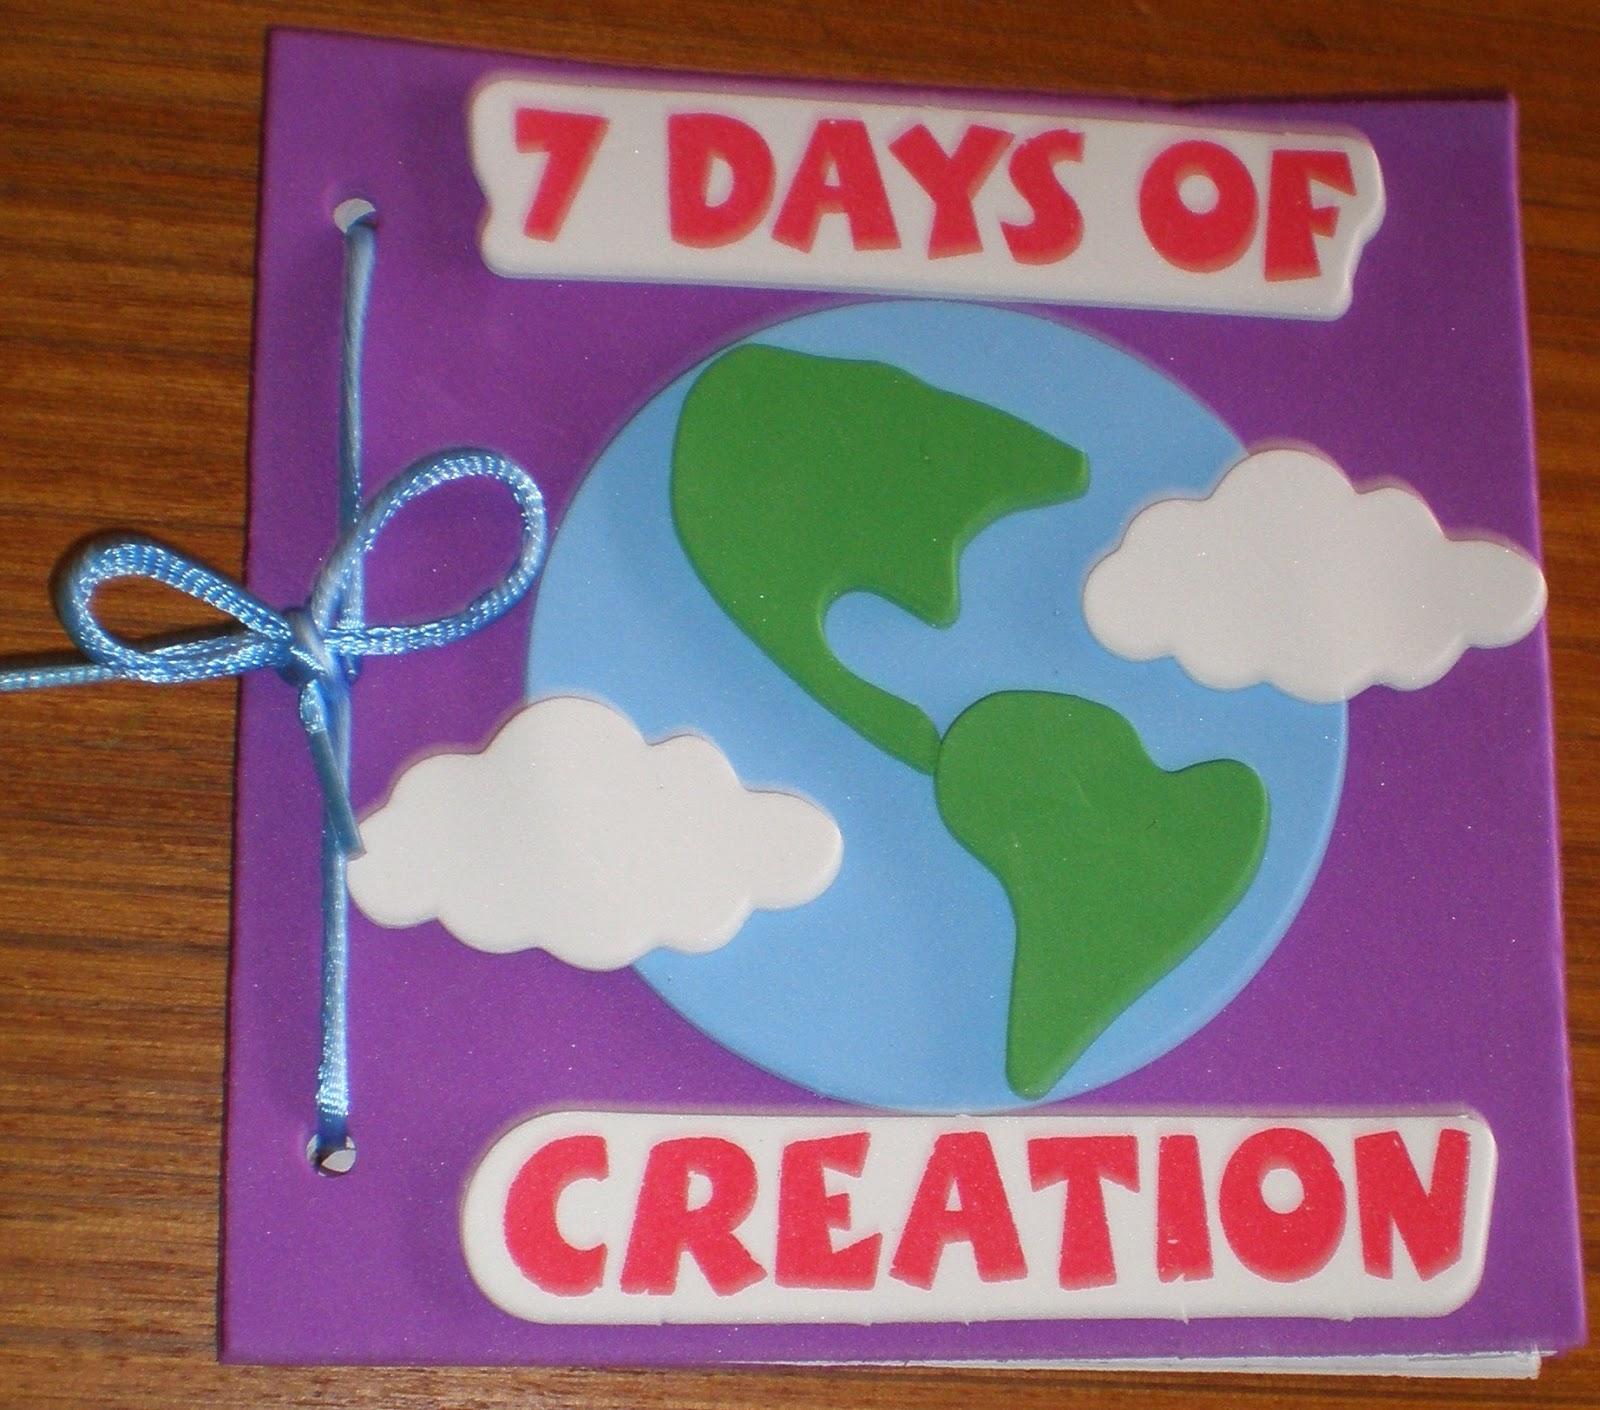 Petersham Bible Book Amp Tract Depot 7 Days Of Creation Book Craft Kit